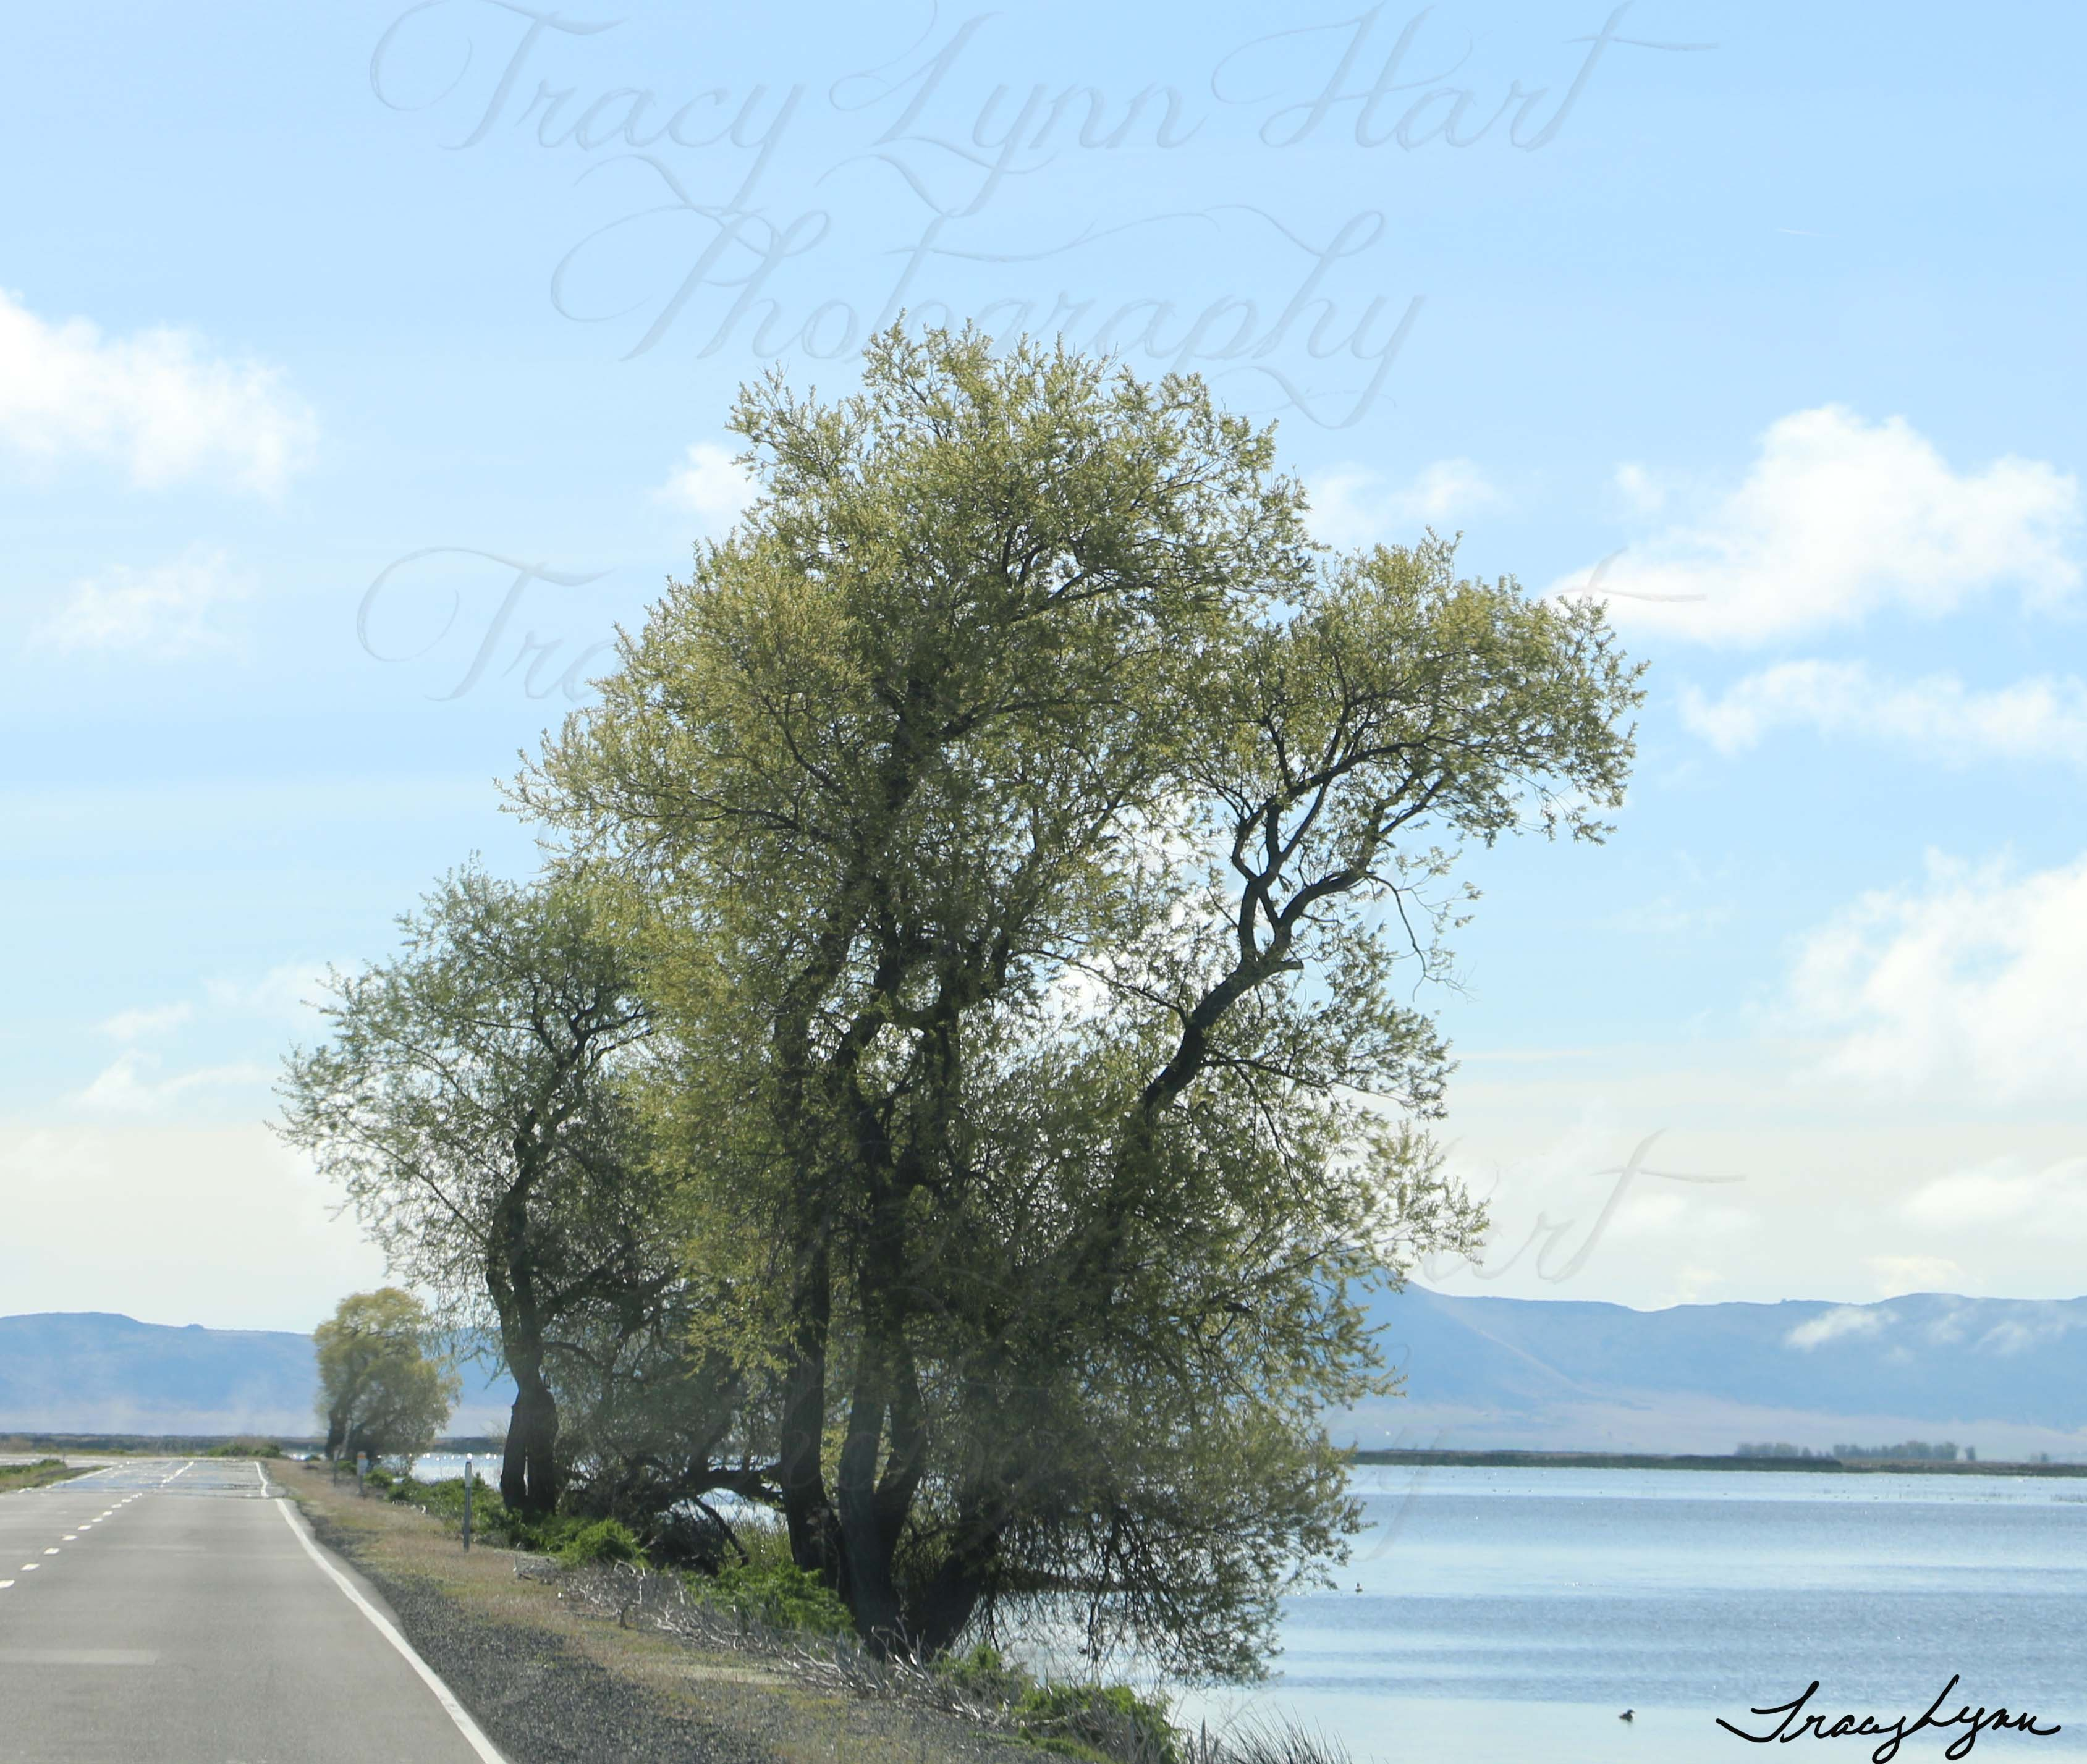 Tree along stateline 1